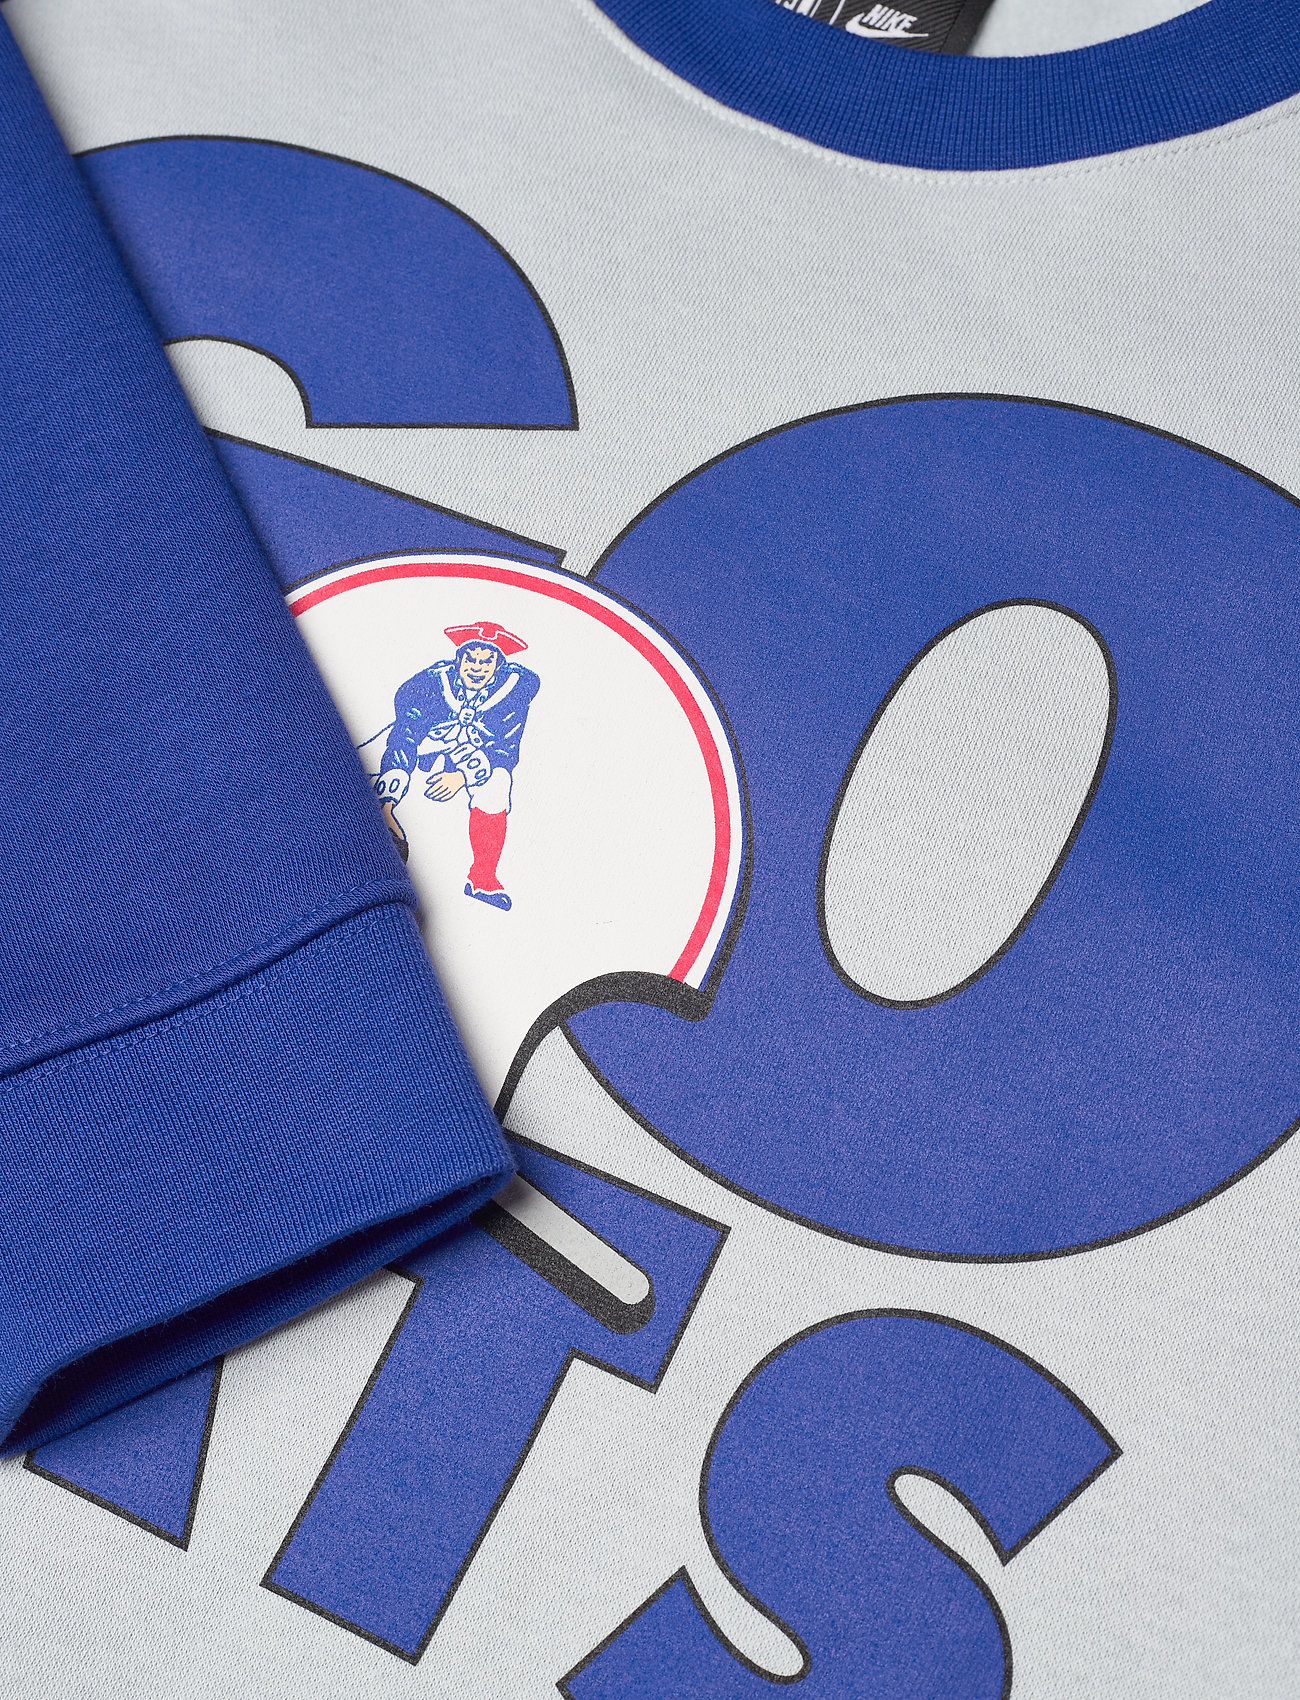 NIKE Fan Gear New England Patriots Nike Go Helmet Historic Raglan - Sweatshirts FIELD SILVER / OLD ROYAL - Menn Klær